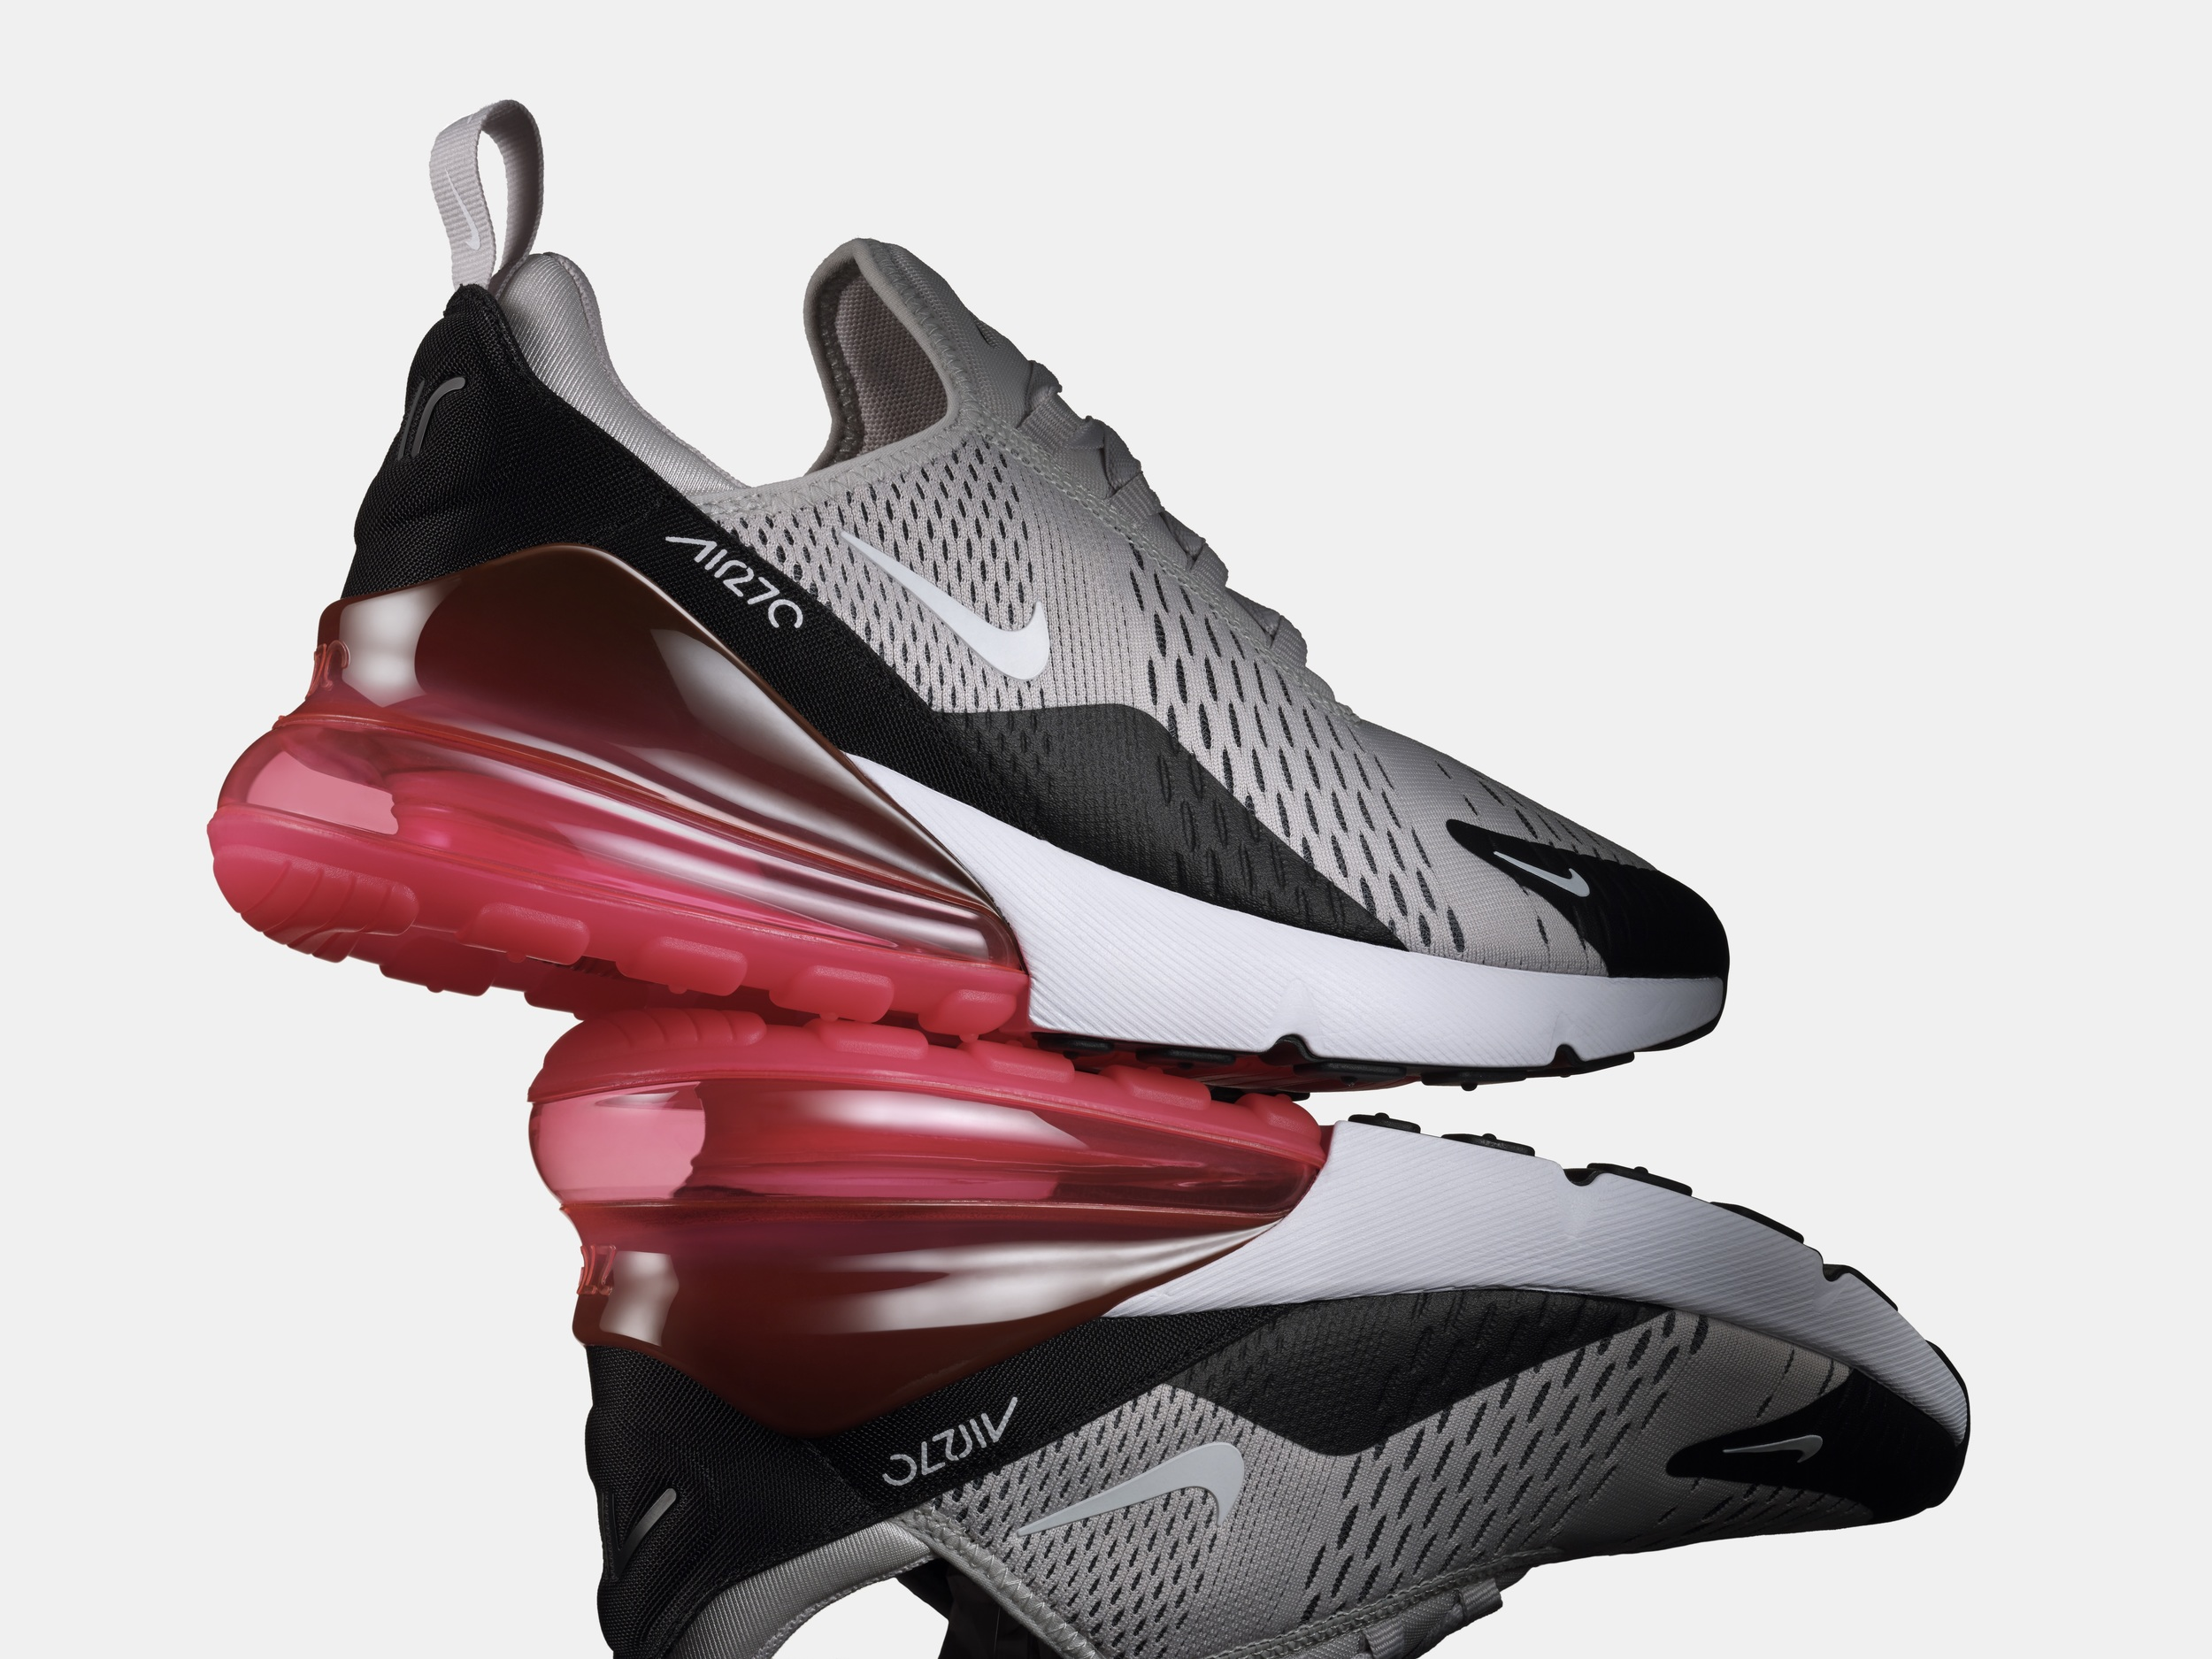 The Nike Air Max 270 Futura, a New Hybrid, Has Finally